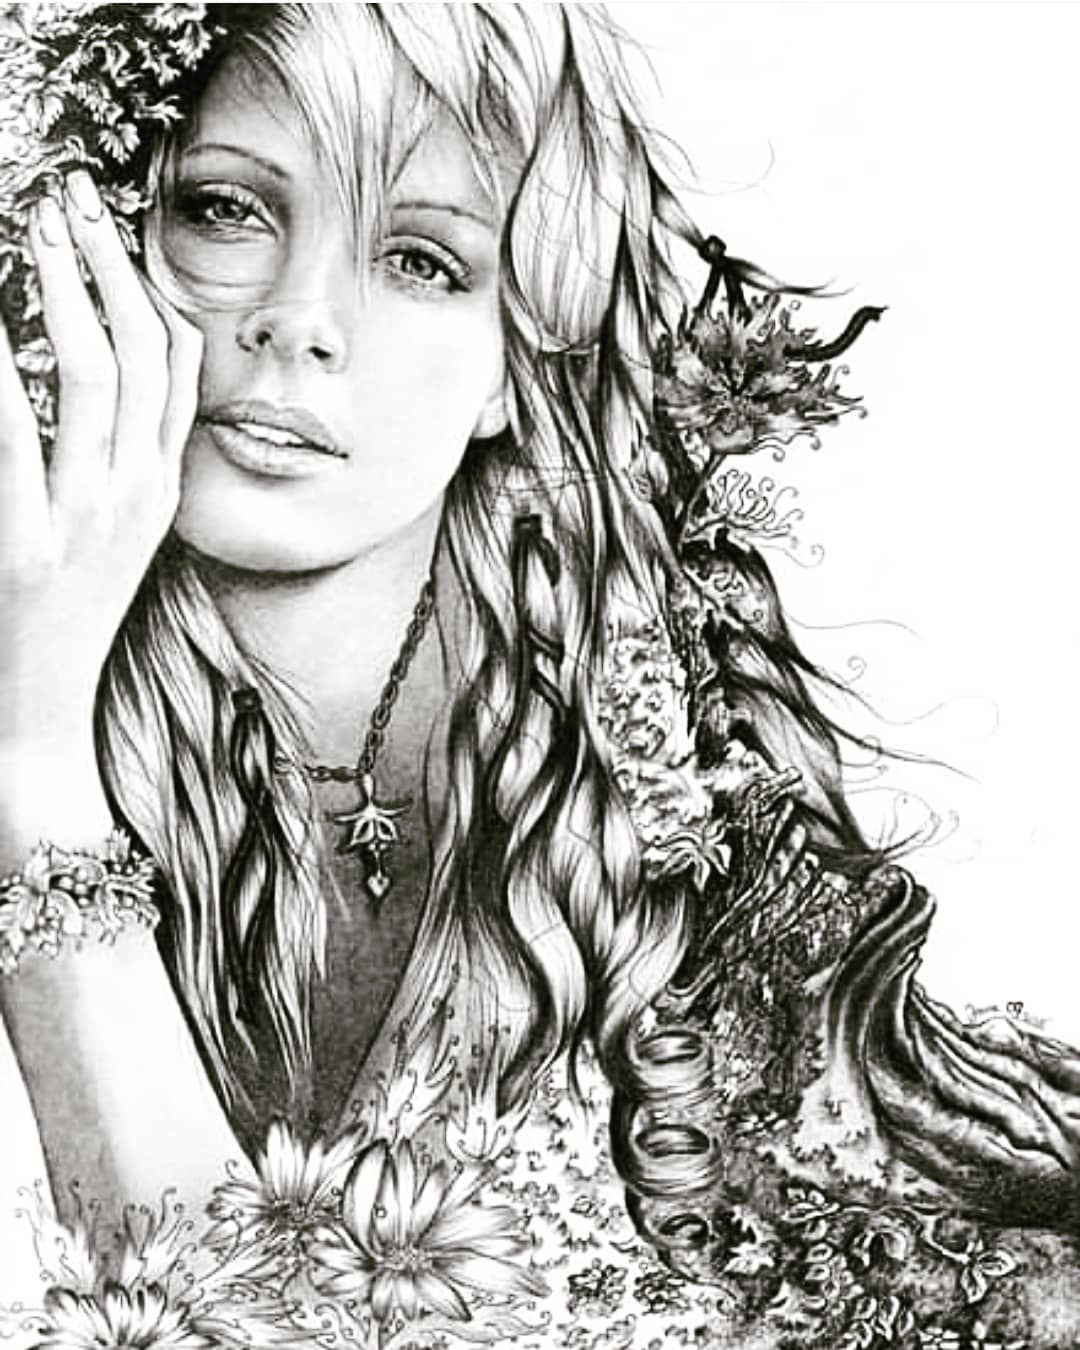 Beautiful... • • #drawing #drawings #drawingoftheday #drawingsketch #drawingchallenge #drawingart #drawing🎨 #drawingaday #pencildrawing #digitaldrawing #drawingsofinstagram #inkdrawing #portraitdrawing #instadrawing #charcoaldrawing #dailydrawing #streamofart🎨 #sketch #sketches #sketchbook #sketchoftheday #sketchaday #pencilsketch #digitalsketch #portrait #portraitphotography #portraits #portraitdrawing #girl #girls